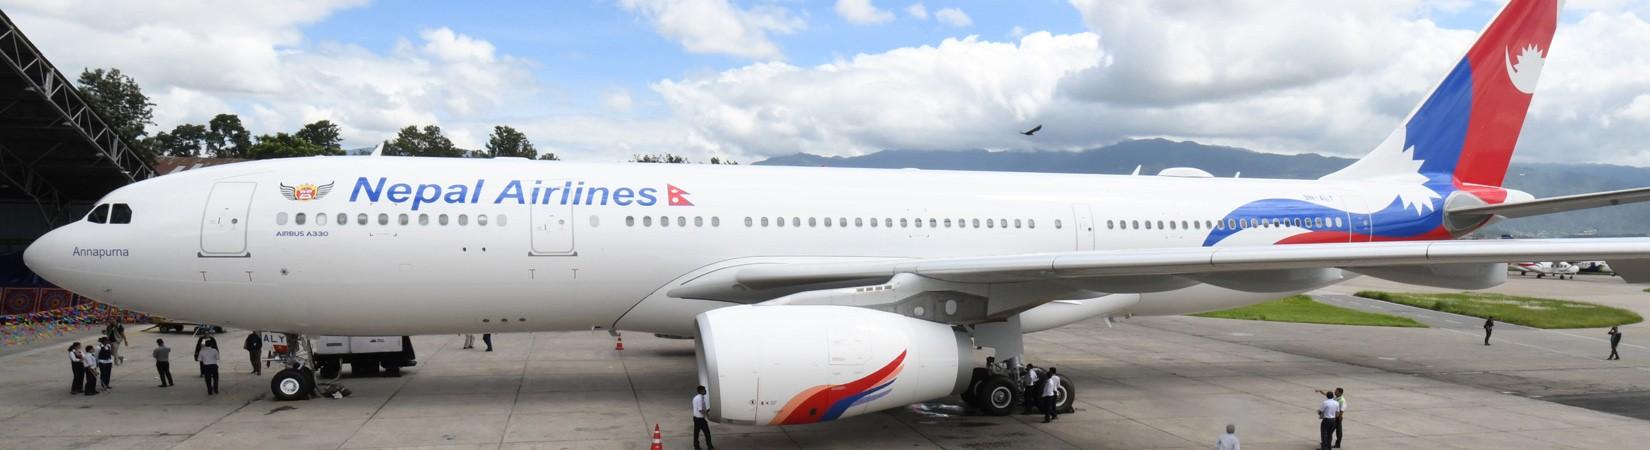 Aéroport de Kathmandu